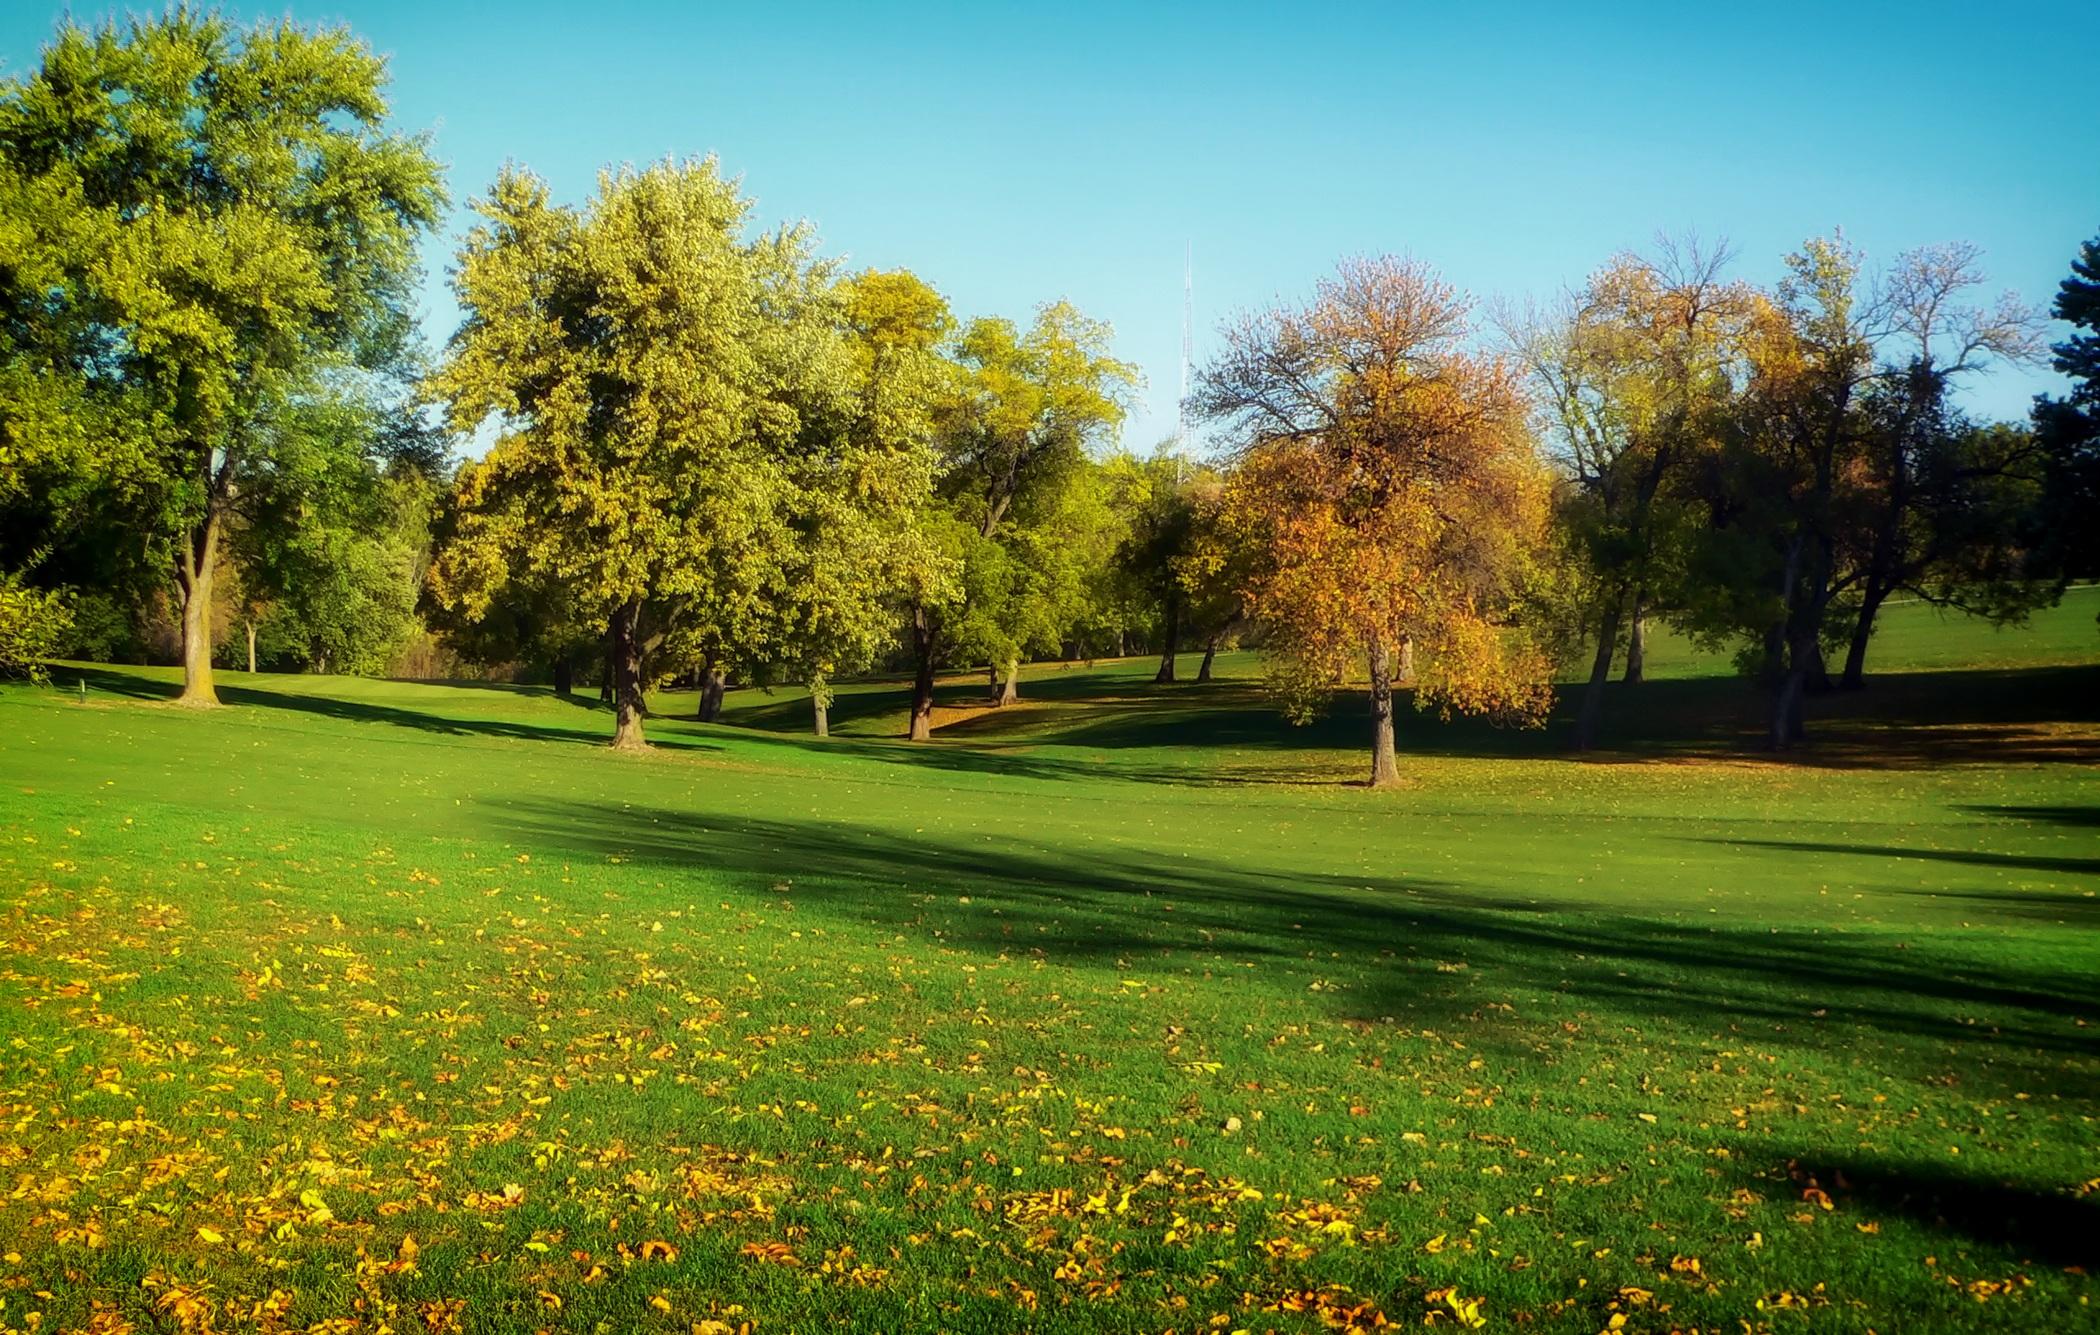 trees-grass-lawn-park.jpg